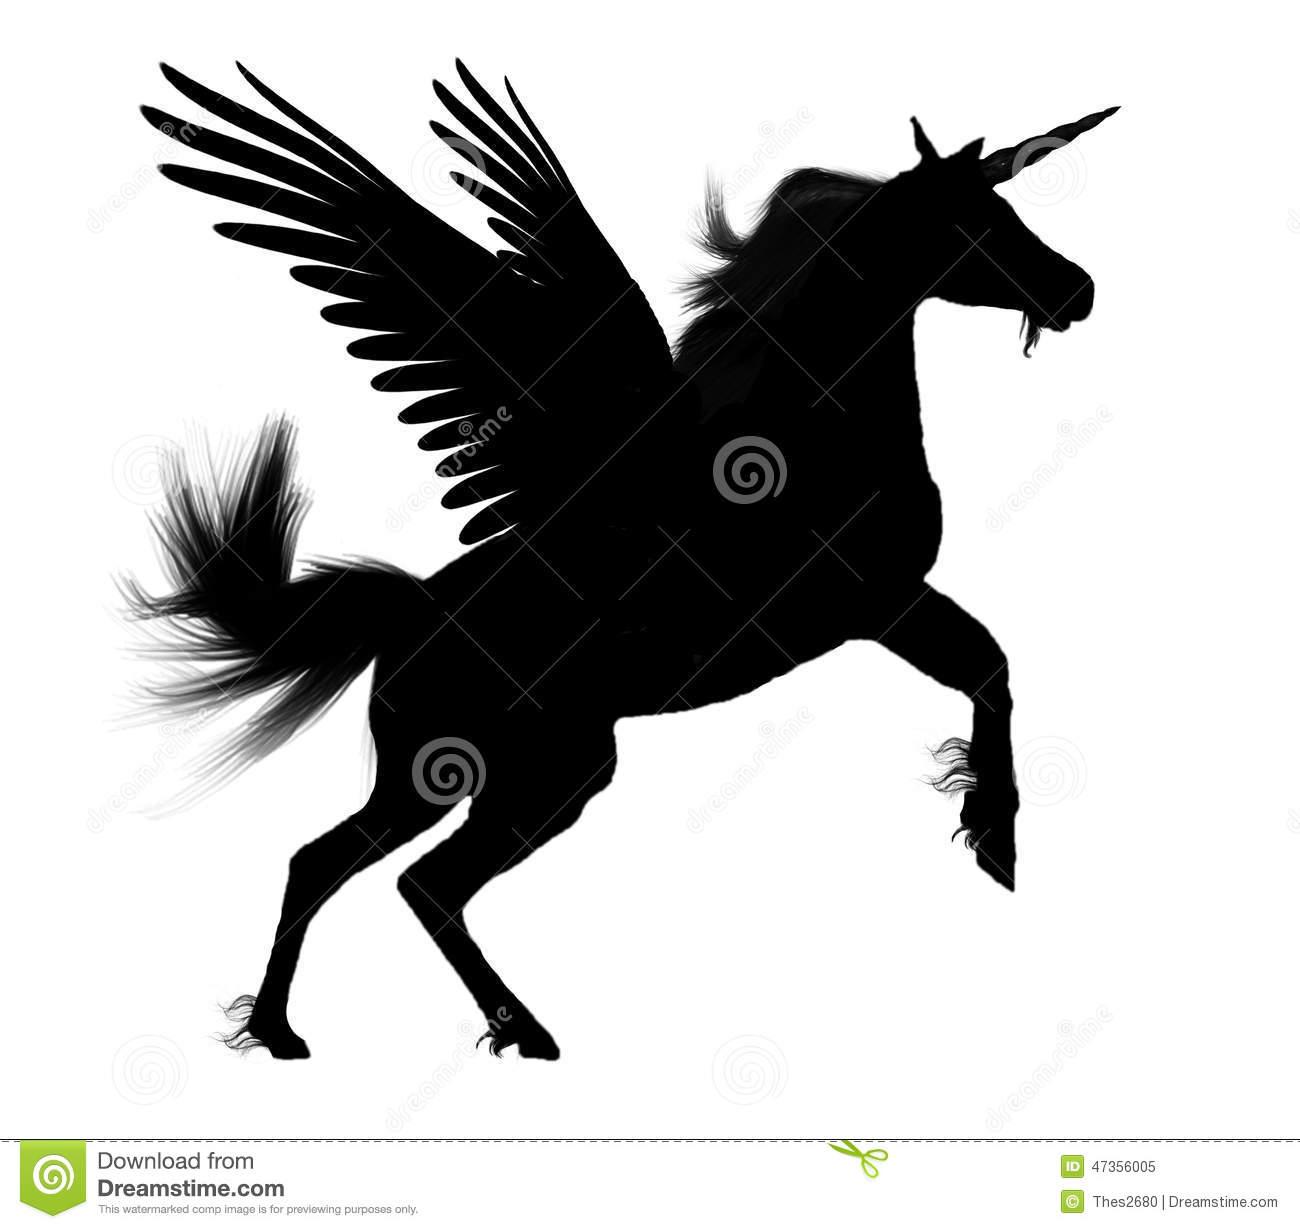 Black pegasus clipart picture royalty free download Black Pegasus Clipart & Free Clip Art Images #20181 - Clipartimage.com picture royalty free download